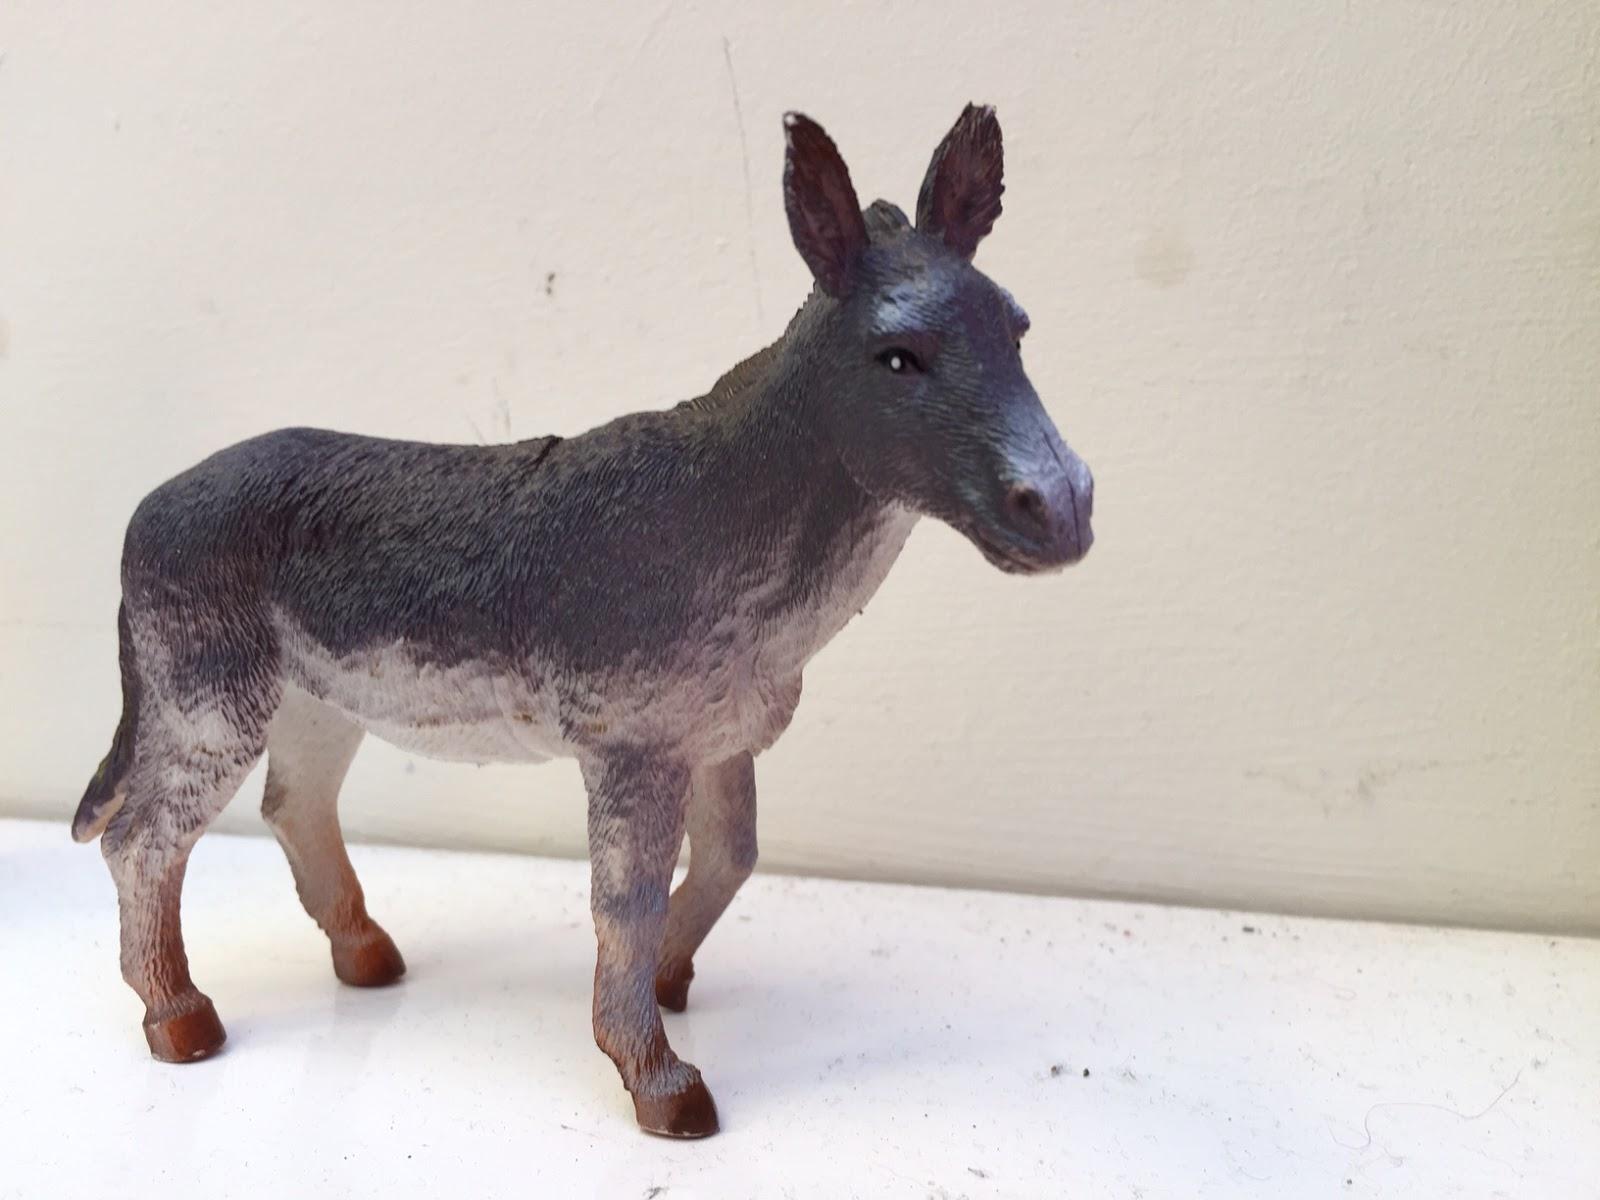 Thread and Thrift: Donkey Days